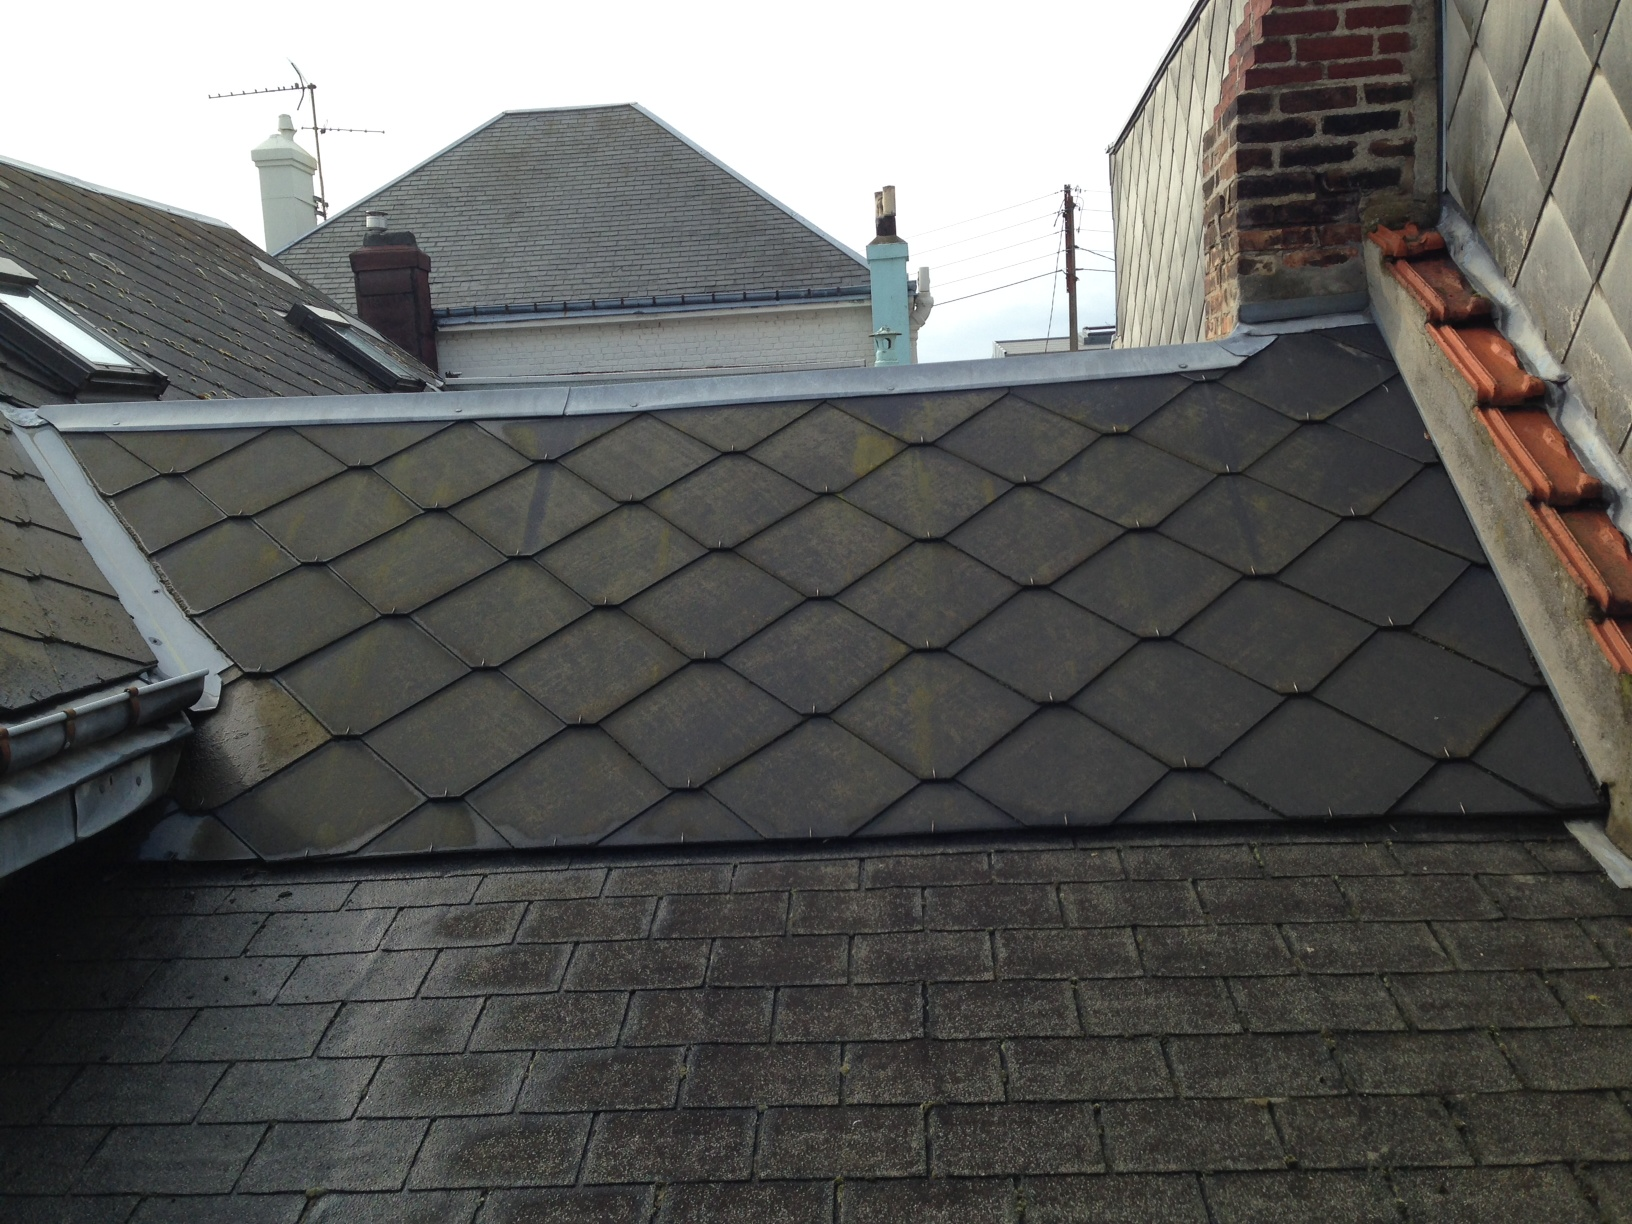 Installation d 39 une chemin e de toit sur toit en ar communaut leroy merlin - Liteau leroy merlin ...